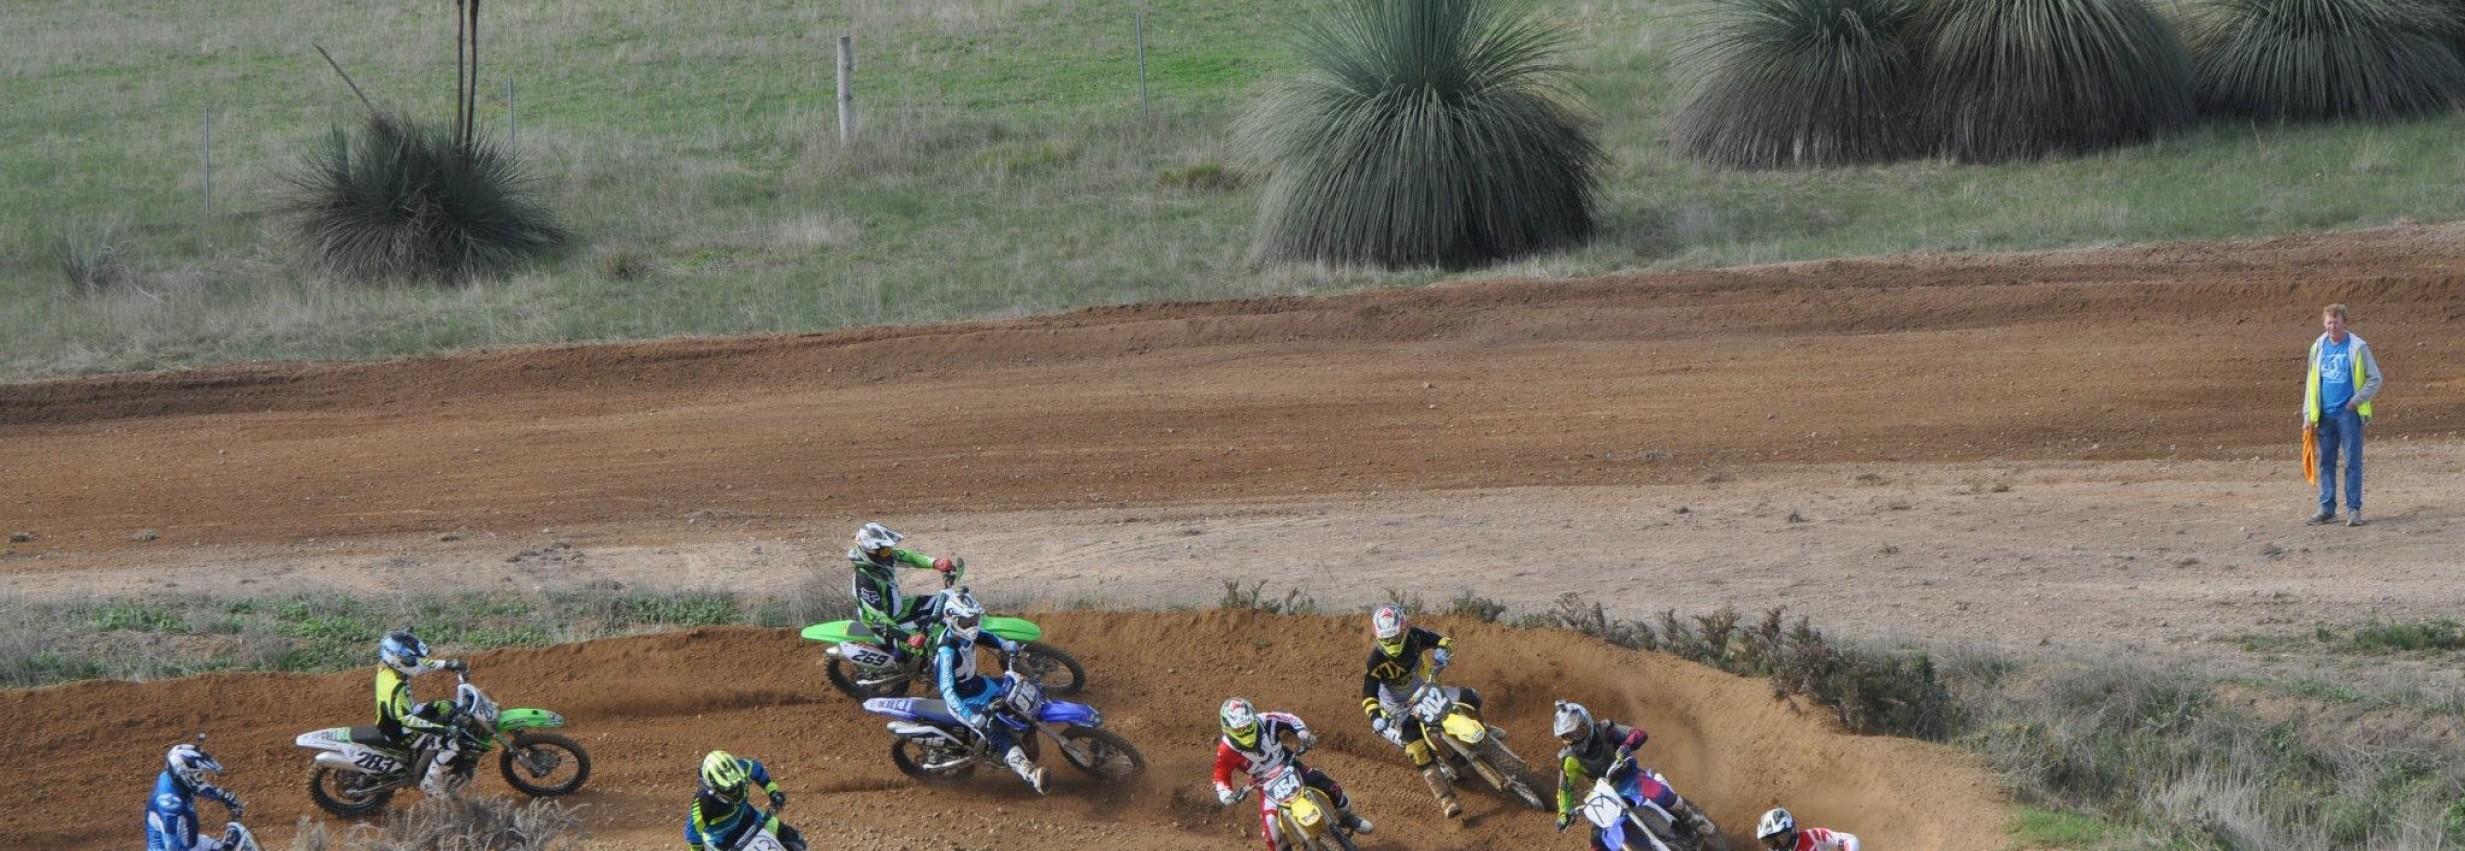 Parawa Motocross Track